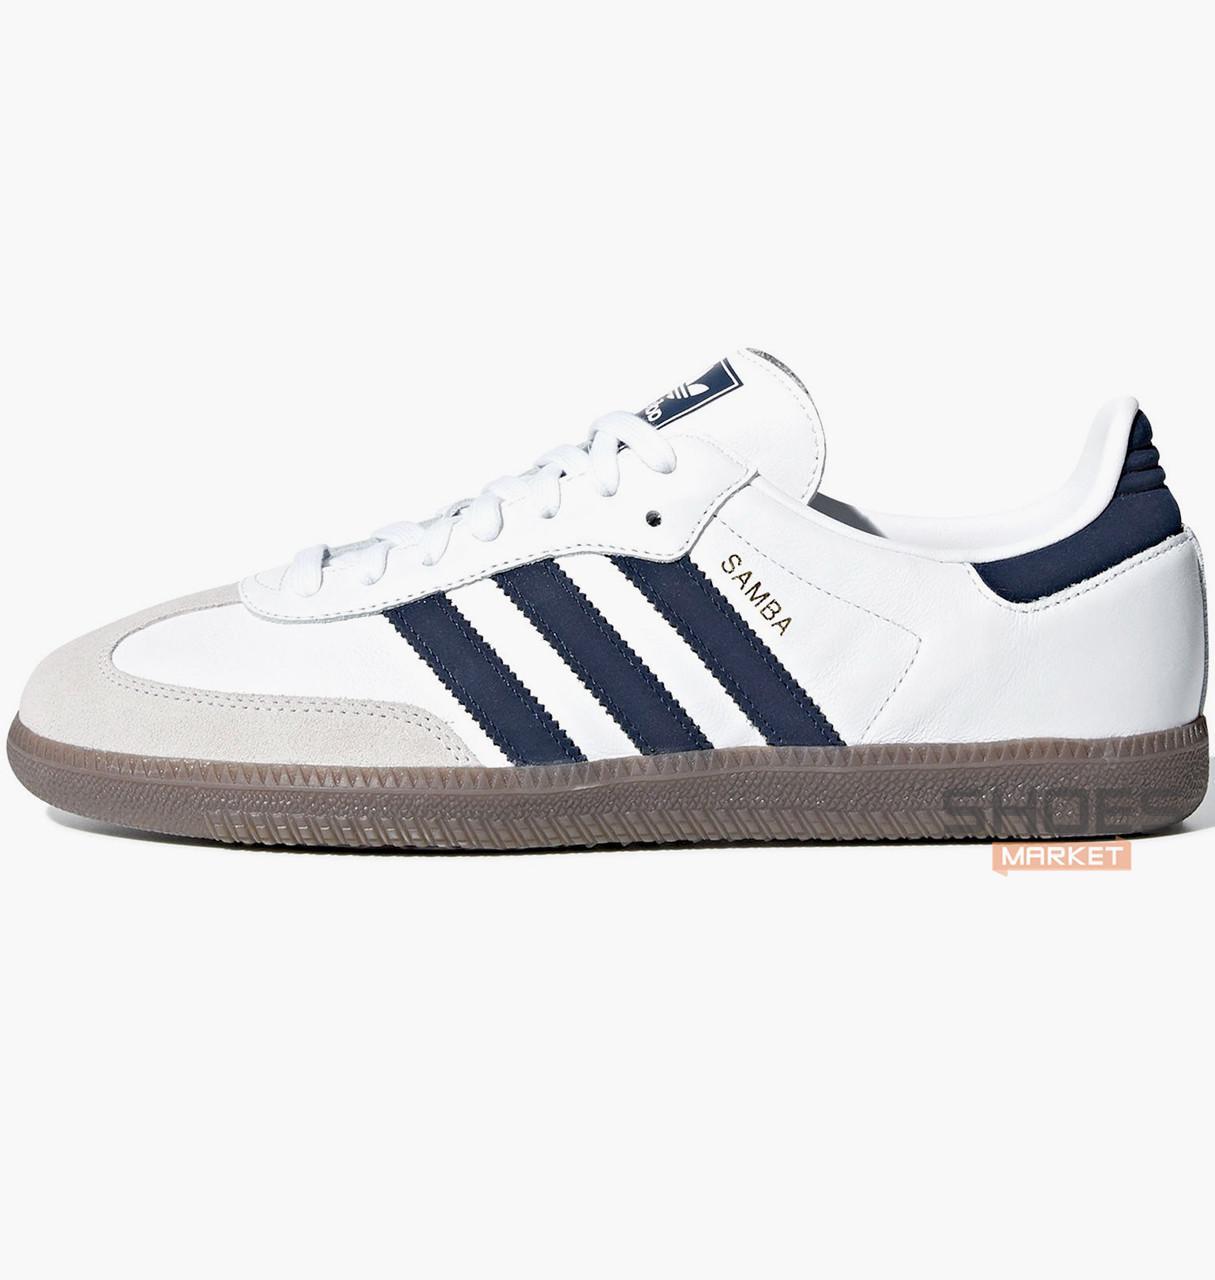 Мужские кроссовки Adidas Samba OG B75680 White/Navy, оригинал